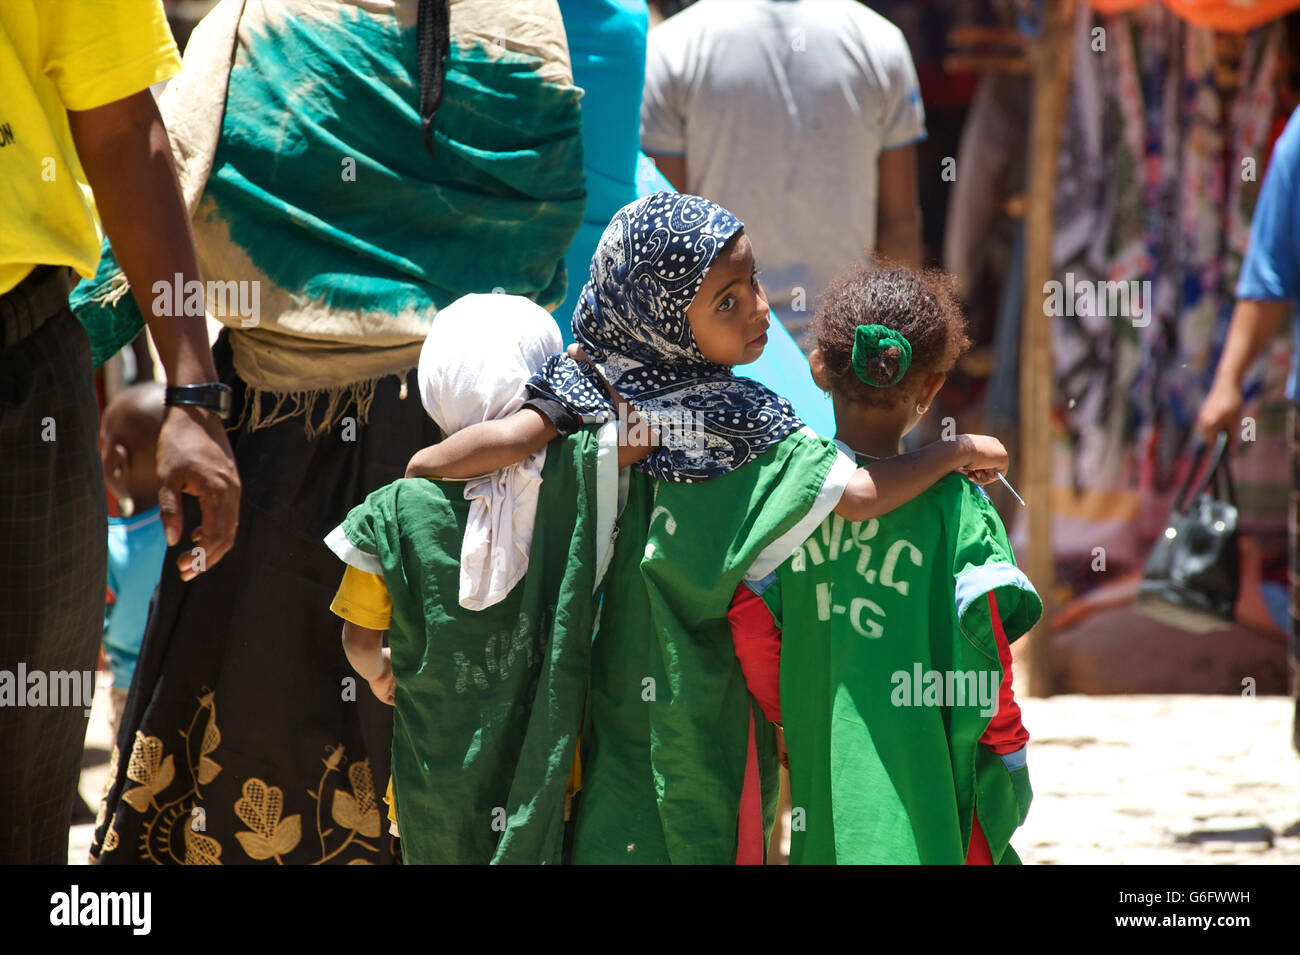 Ethiopian schoolchildren arm in arm  together in the street, Harar, Ethiopia - Stock Image